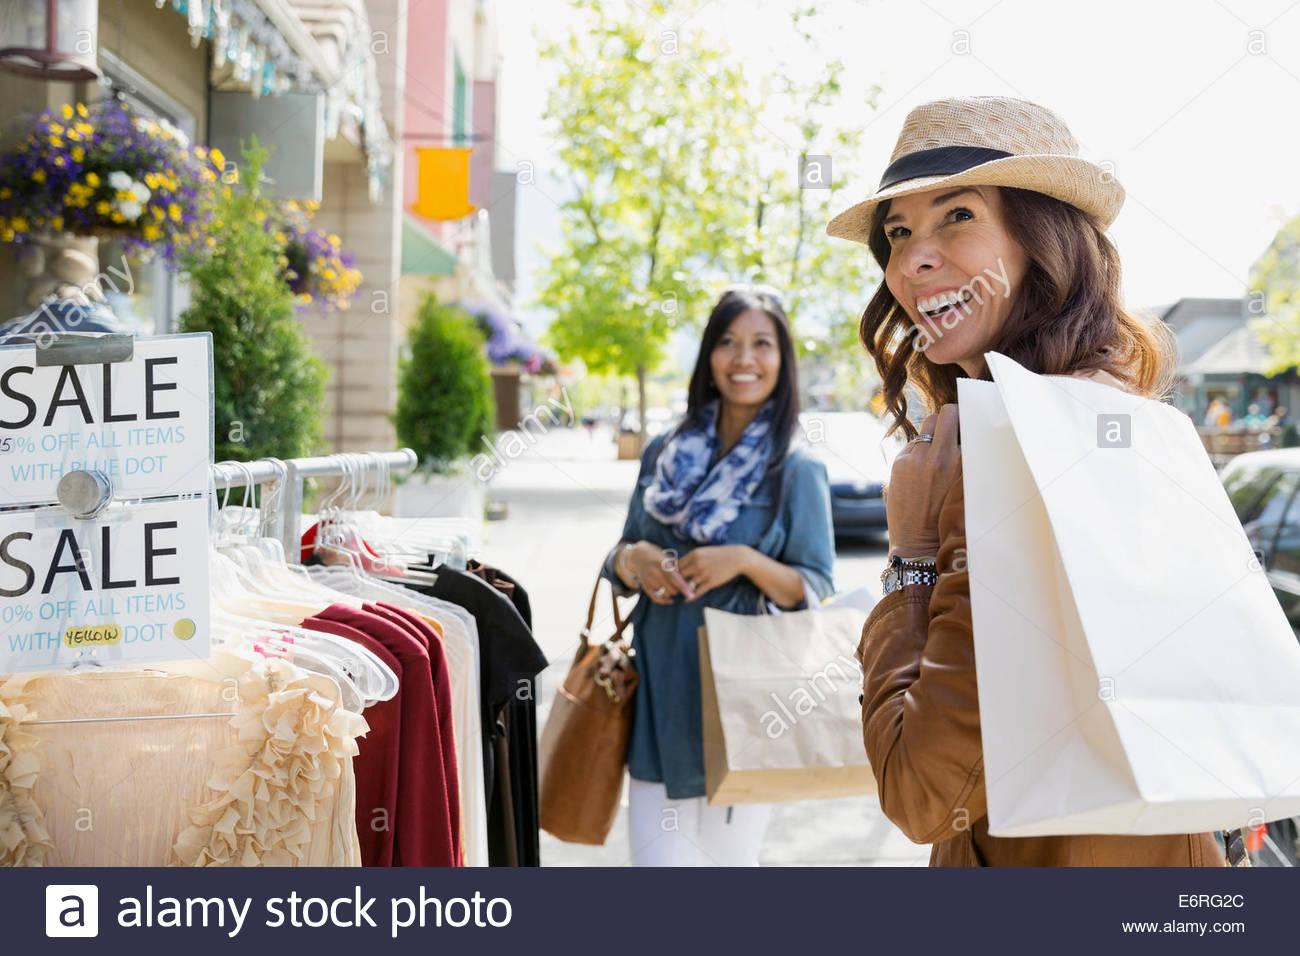 Women shopping on village street - Stock Image